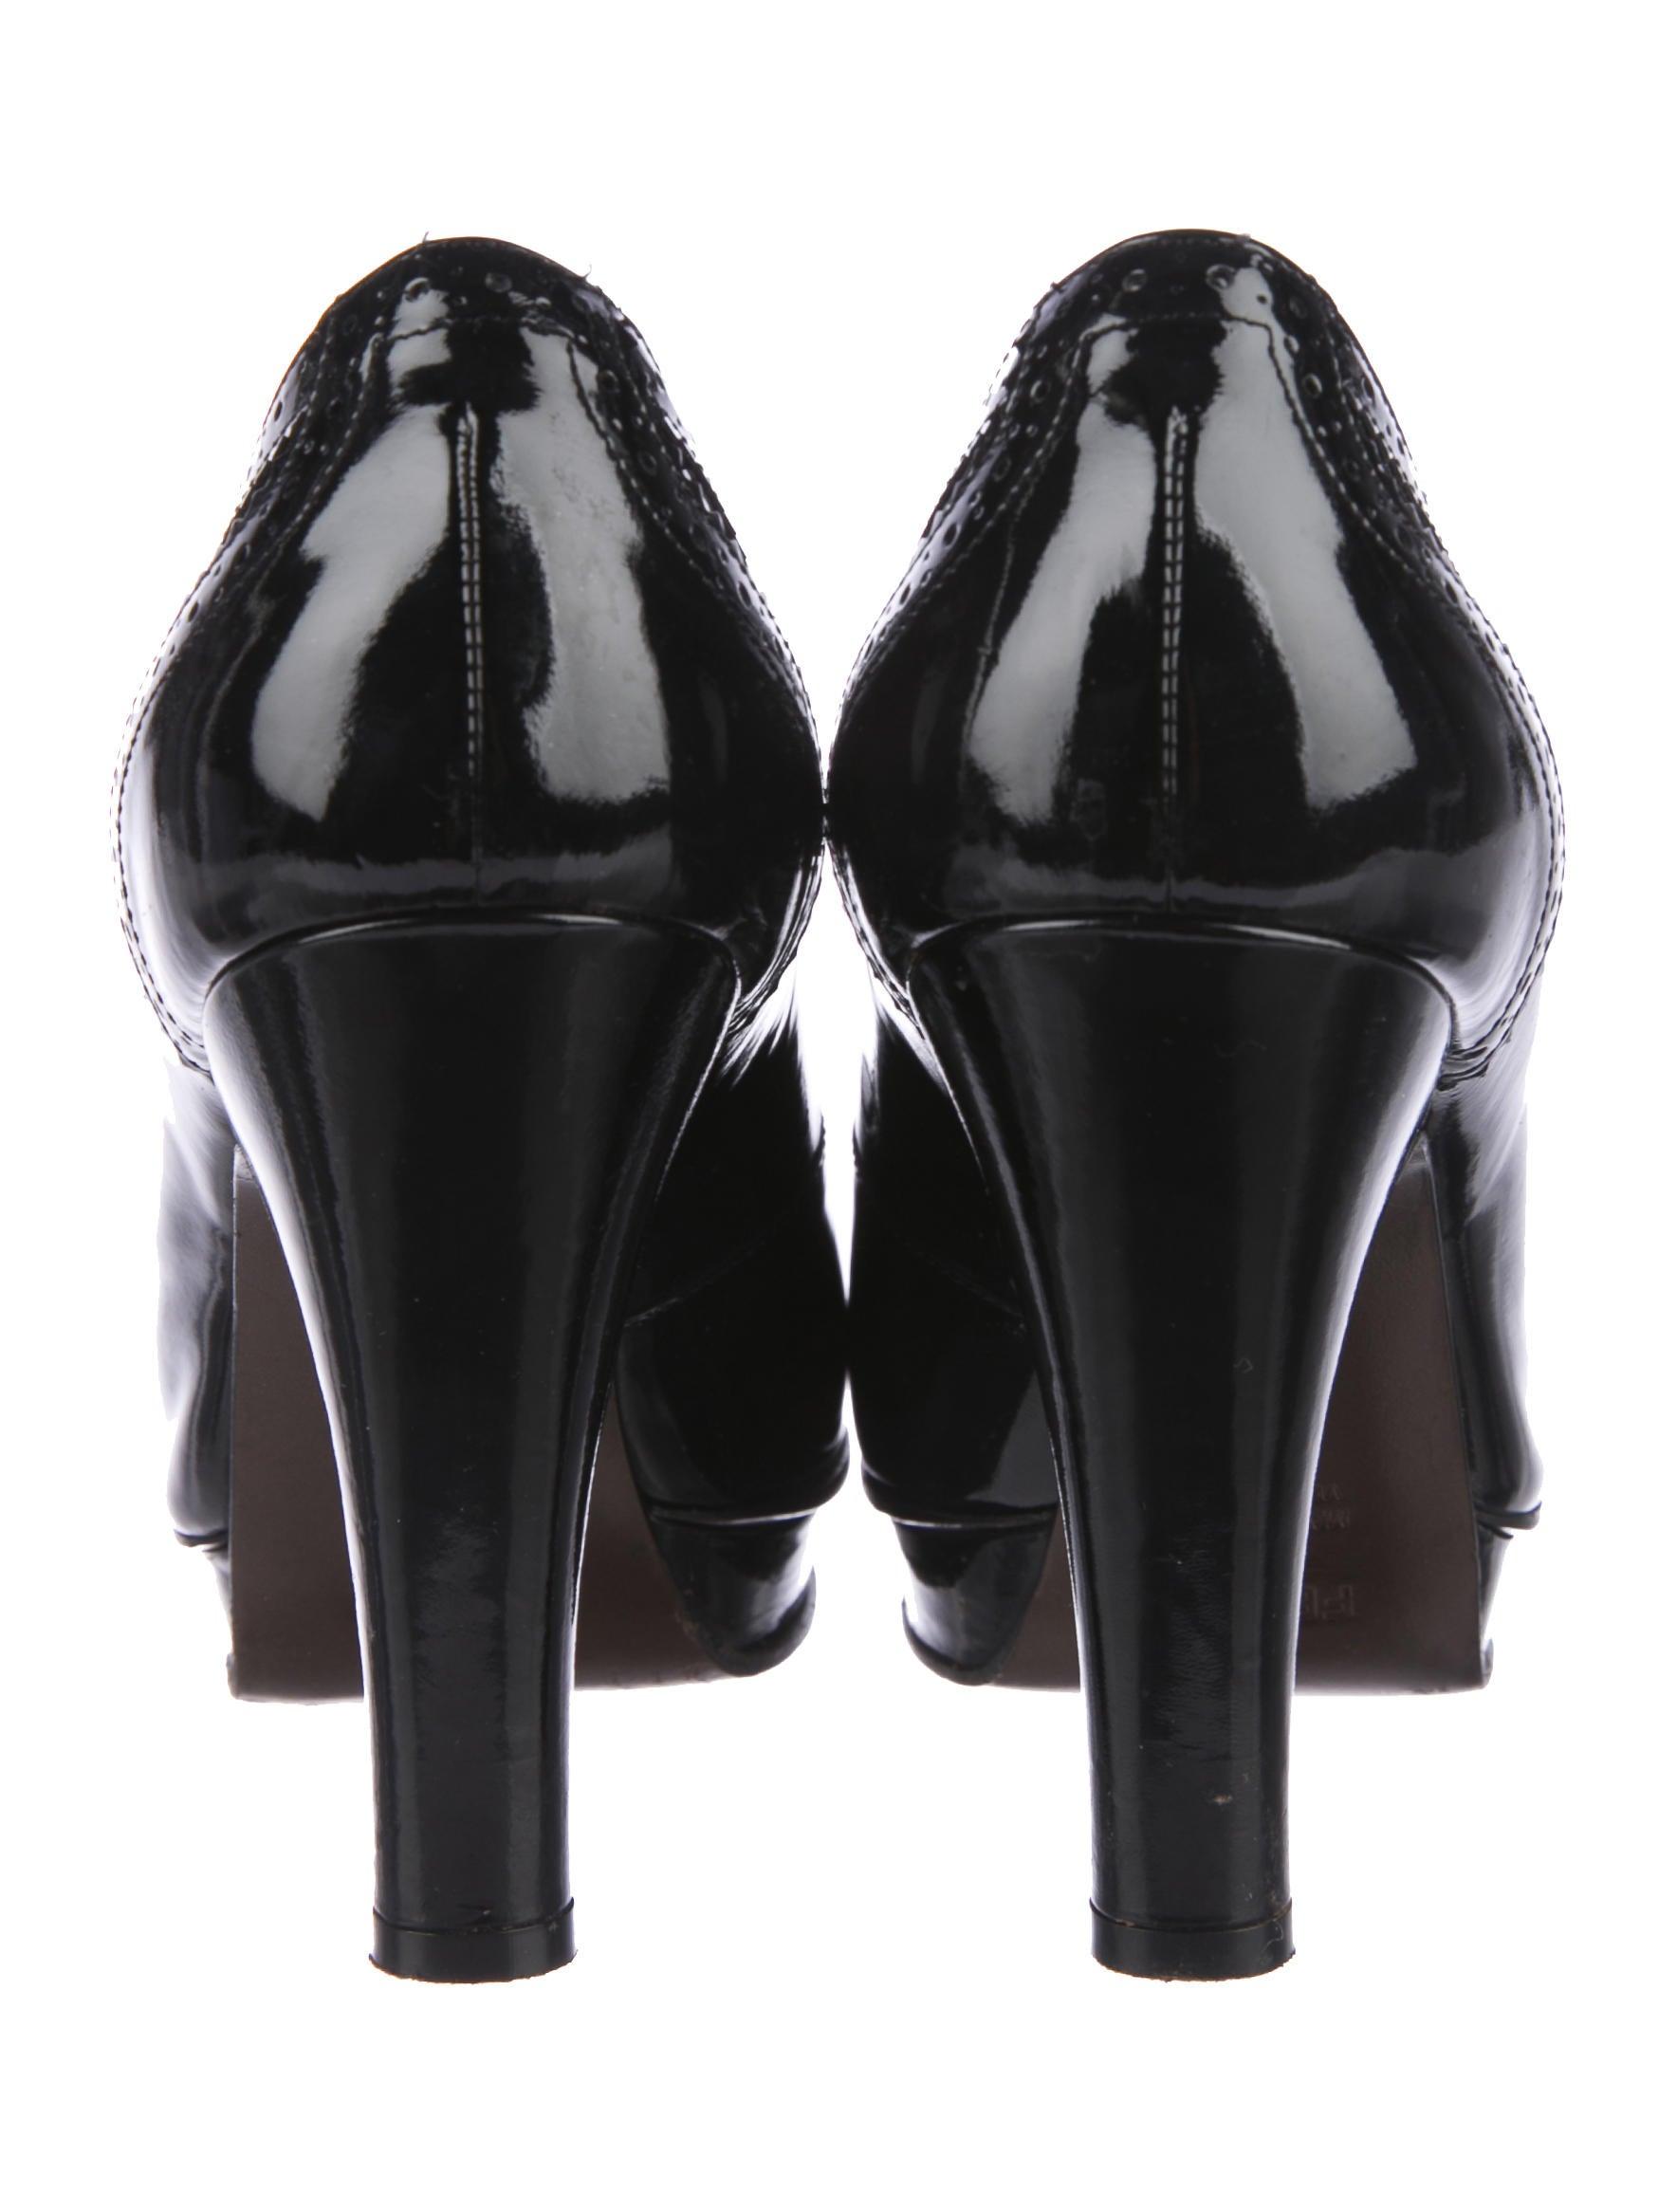 Fendi Brogue Peep-Toe Booties under $60 outlet fashion Style discount explore esgfb